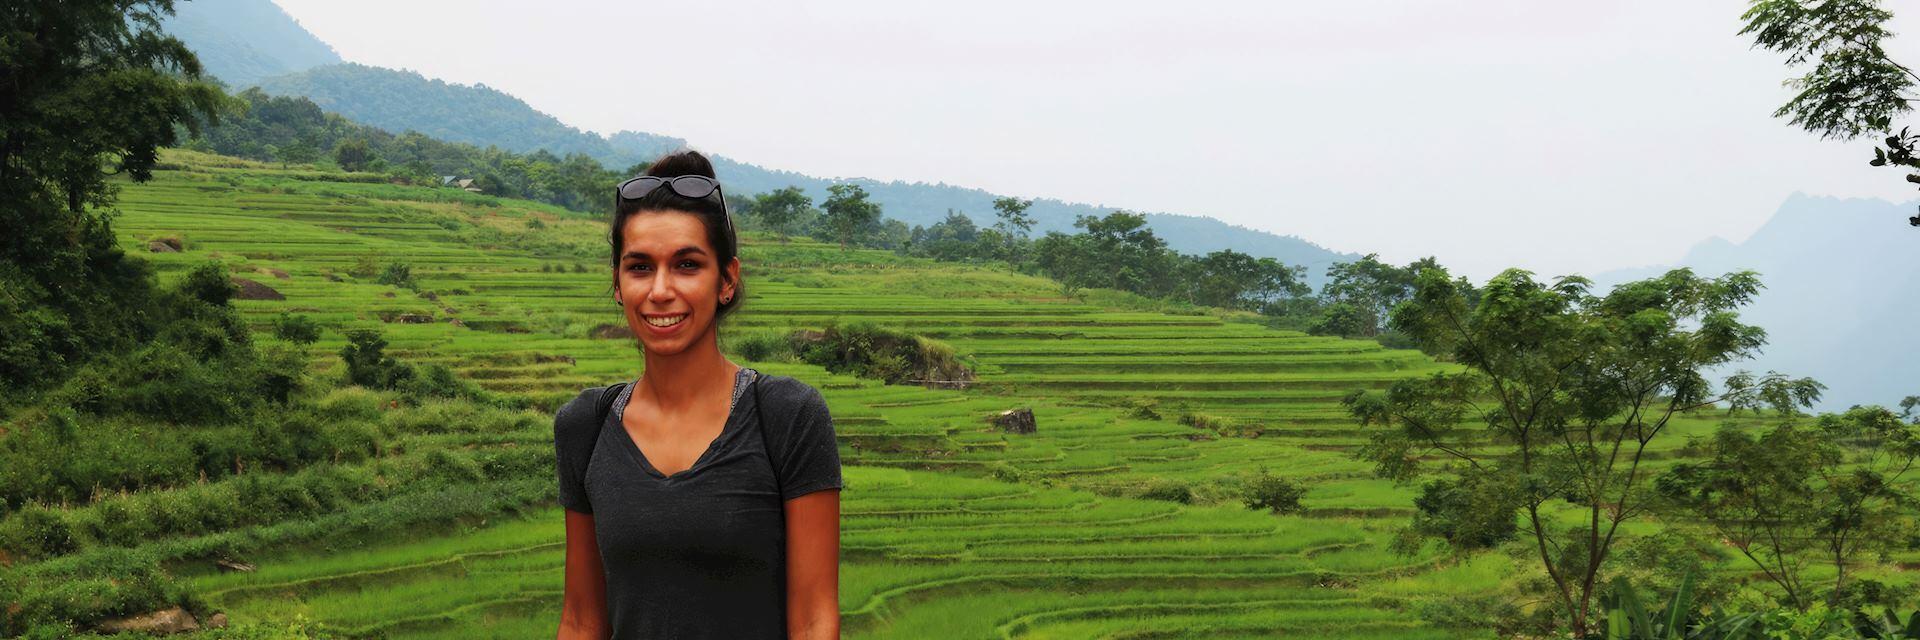 Natasha in Mai Chau, Vietnam